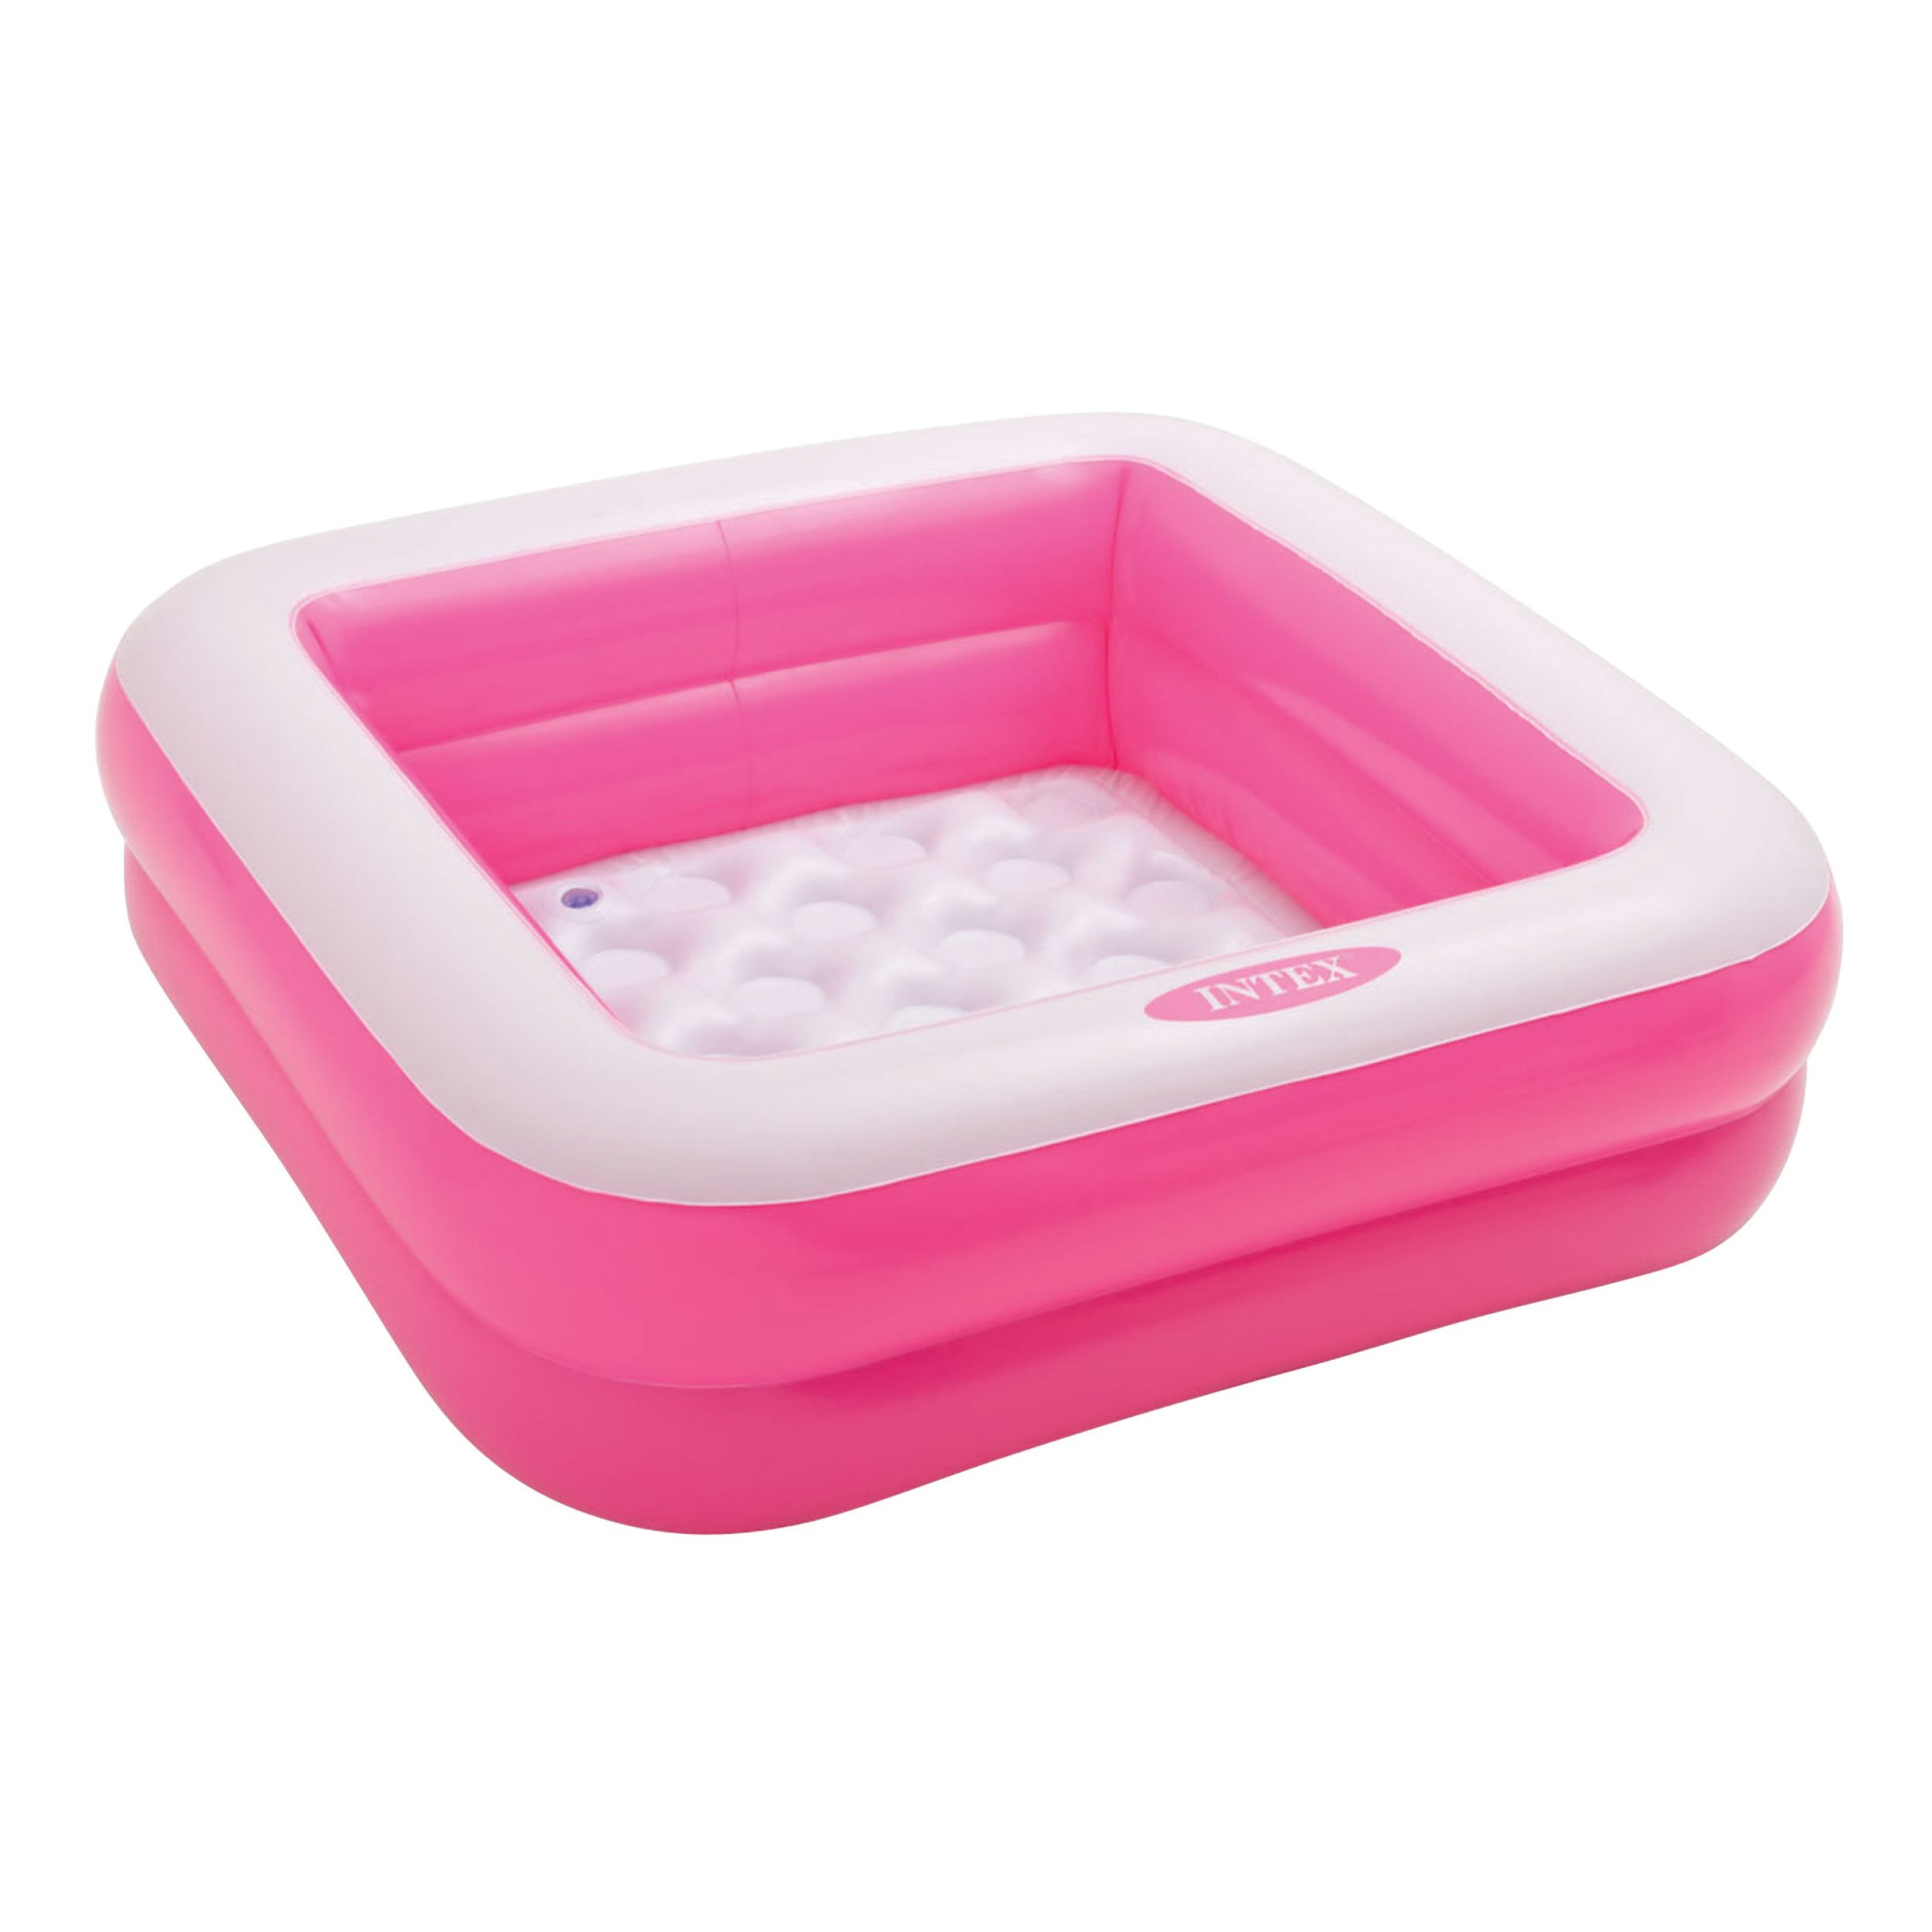 Intex opblaaszwembadje vierkant roze 85cm